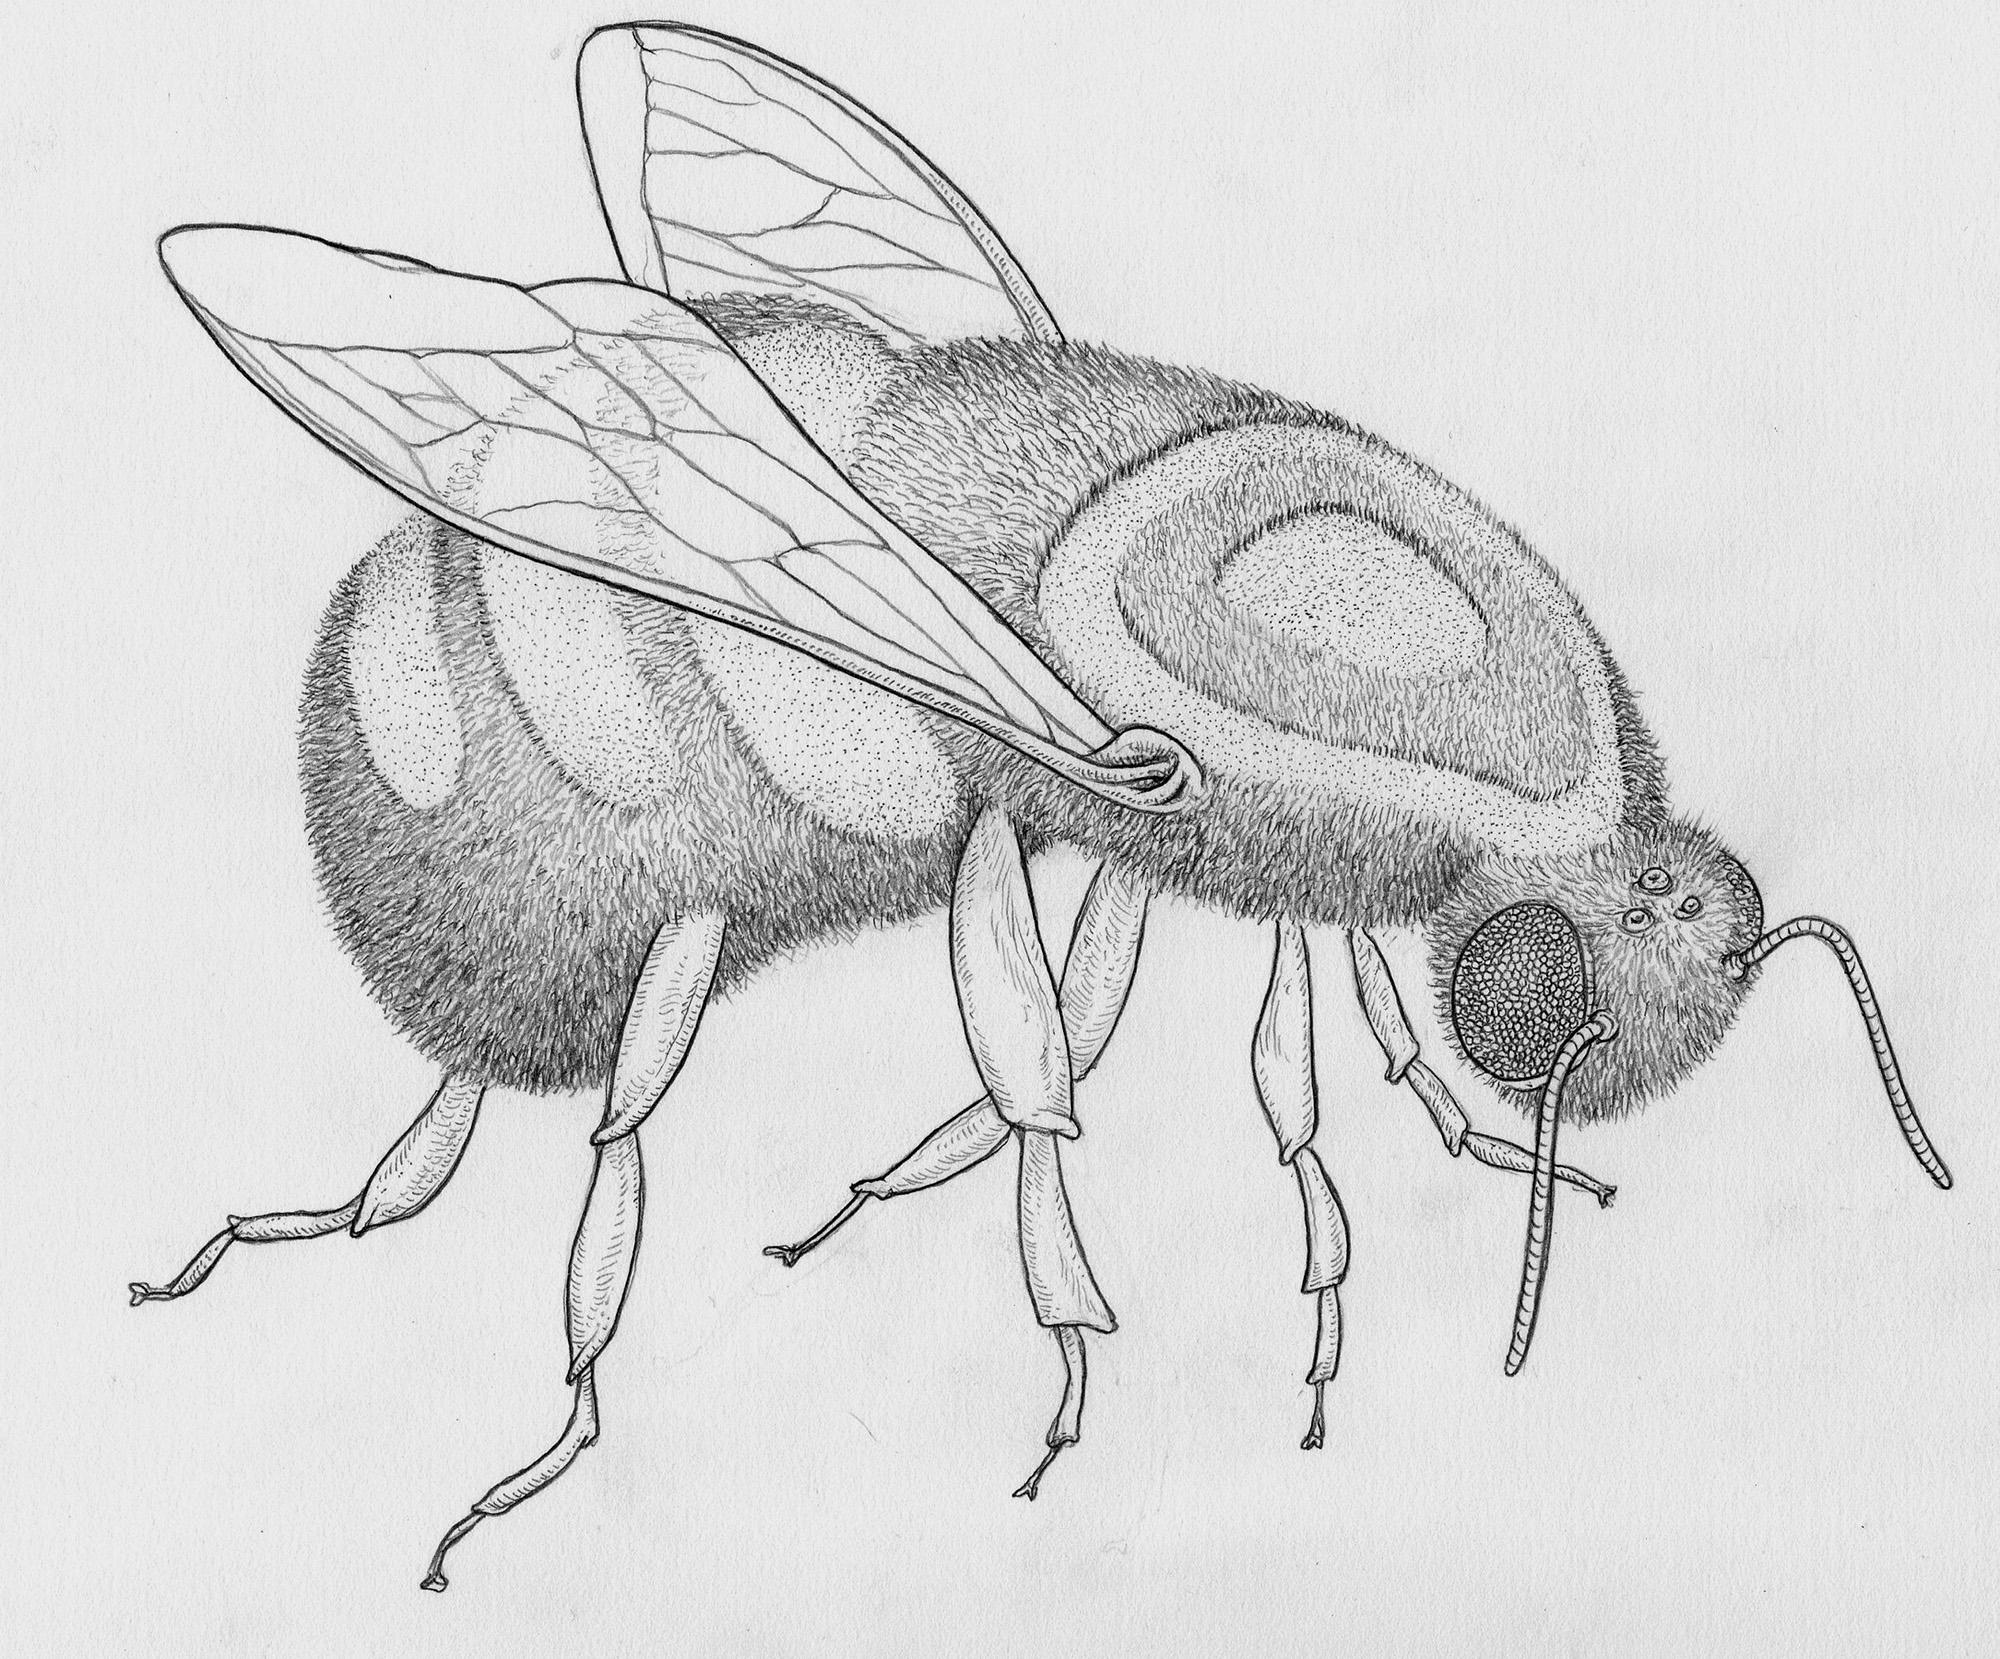 shaved-bee-1-graphite-web.jpg